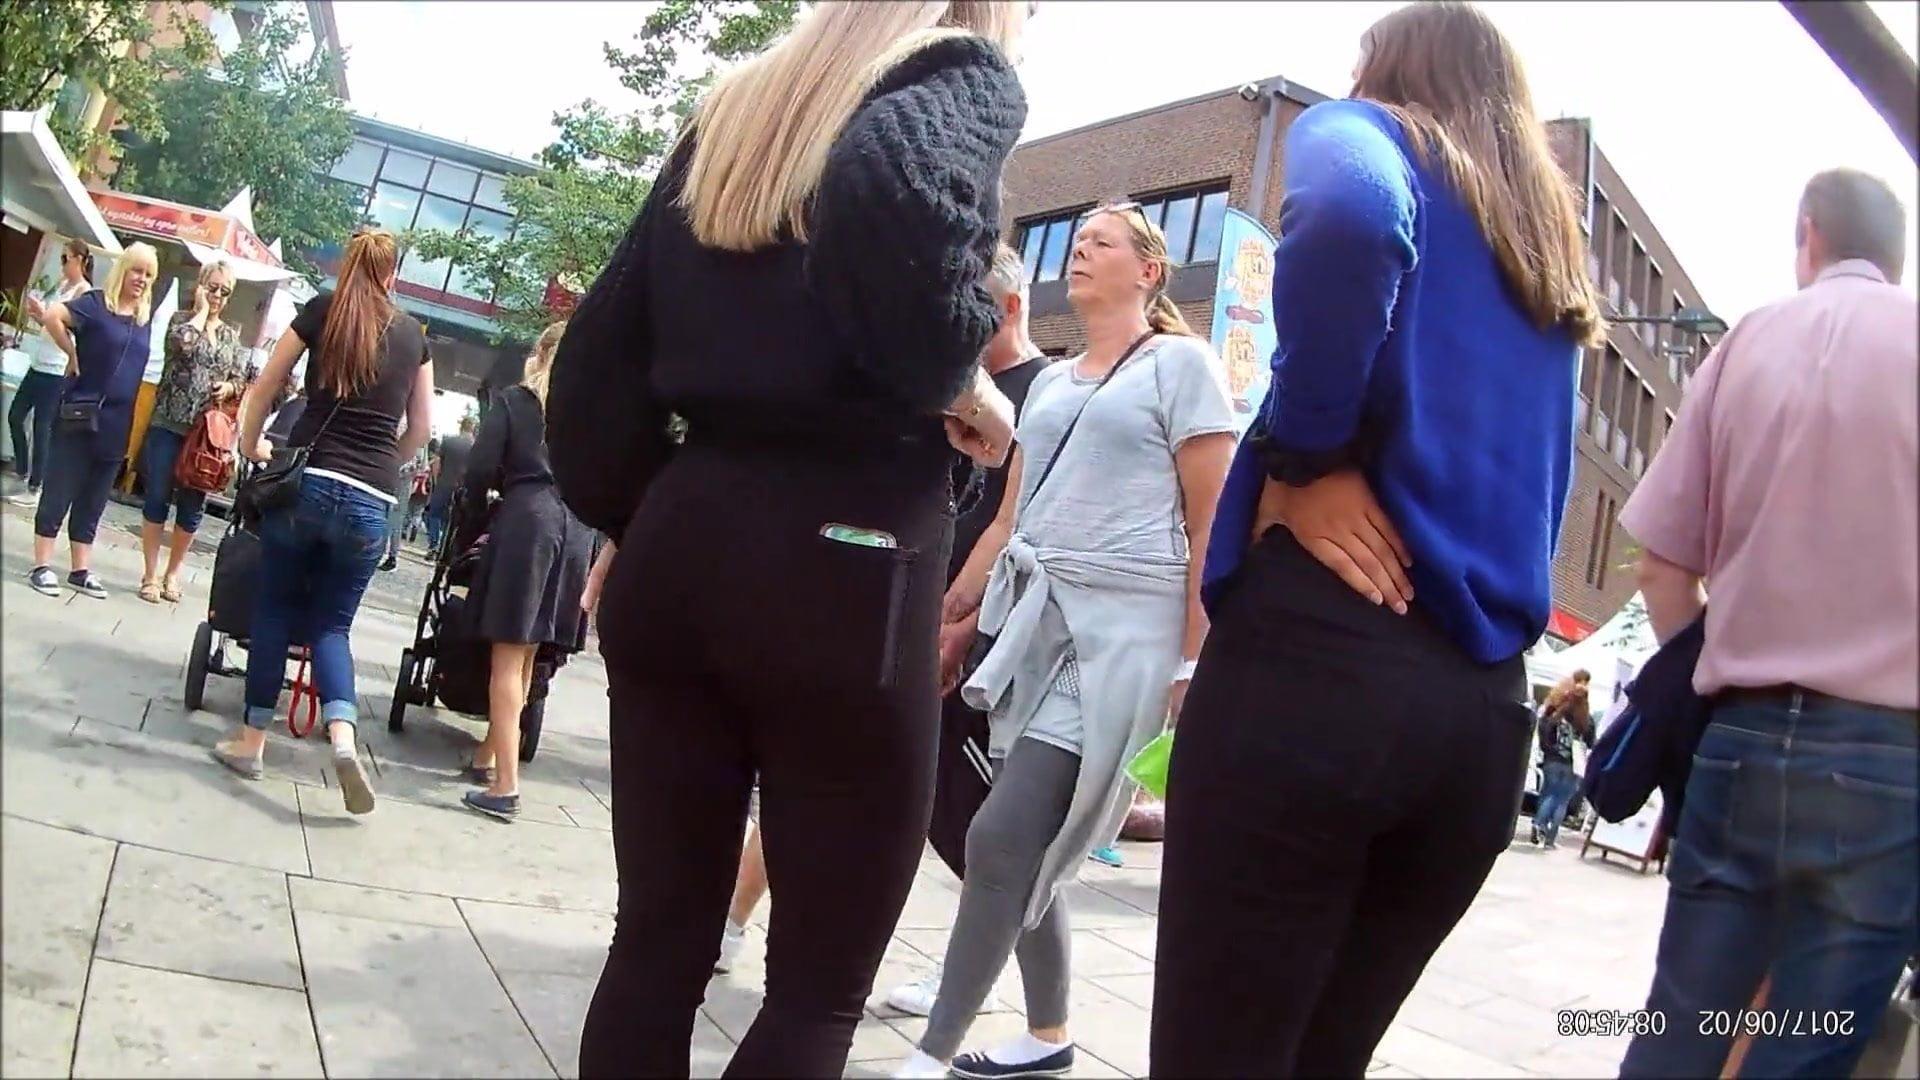 Norwegian girlfriends cute asses!